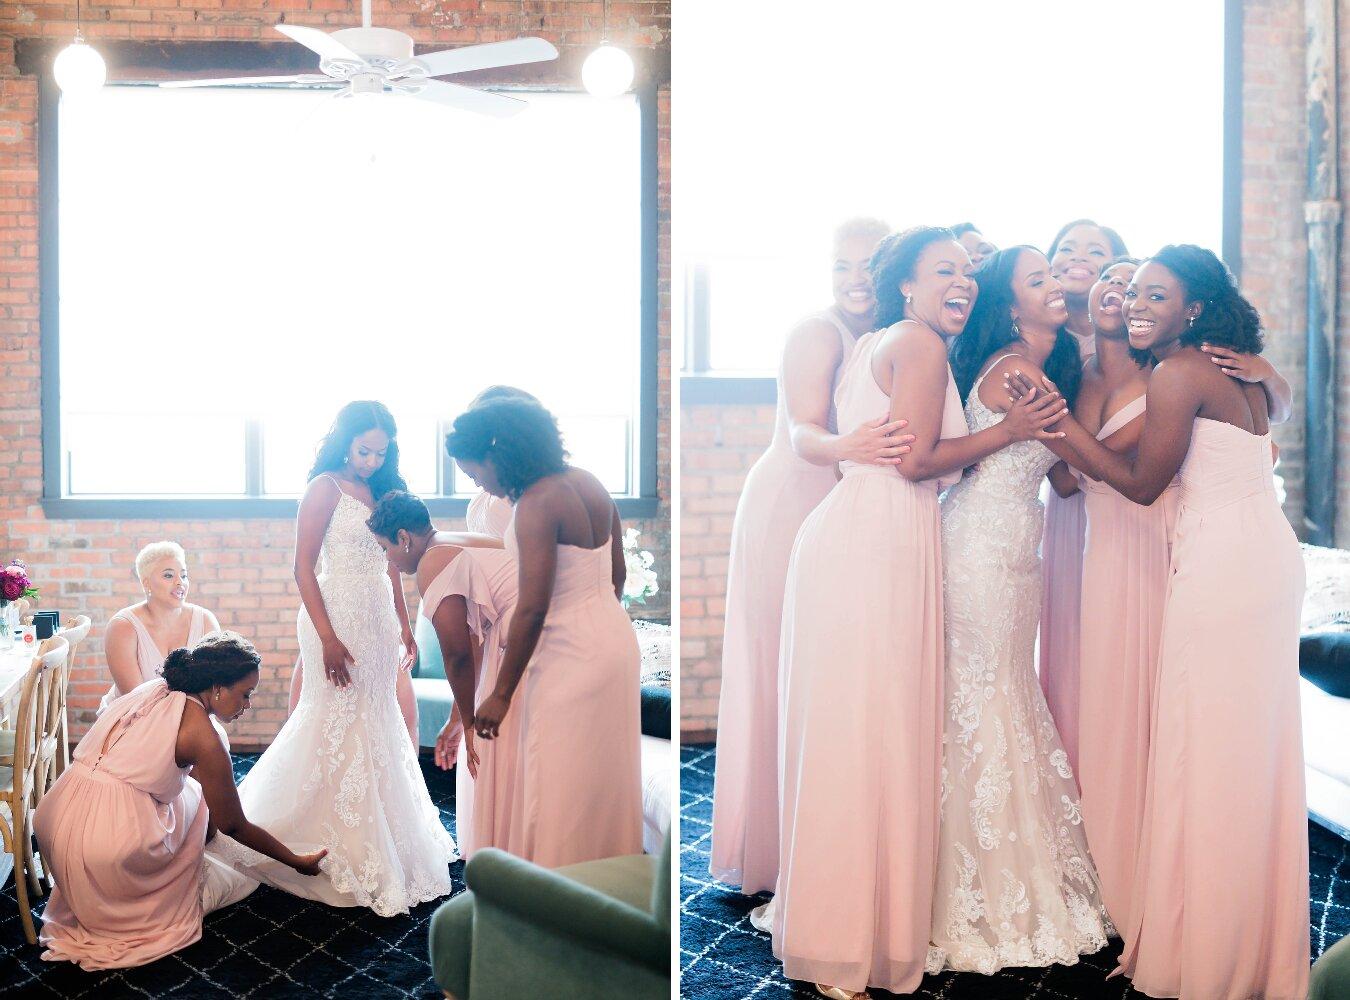 Dallas Wedding- Pharris Photography- Getting Ready- Sophie + Kellen -Bridesmaids